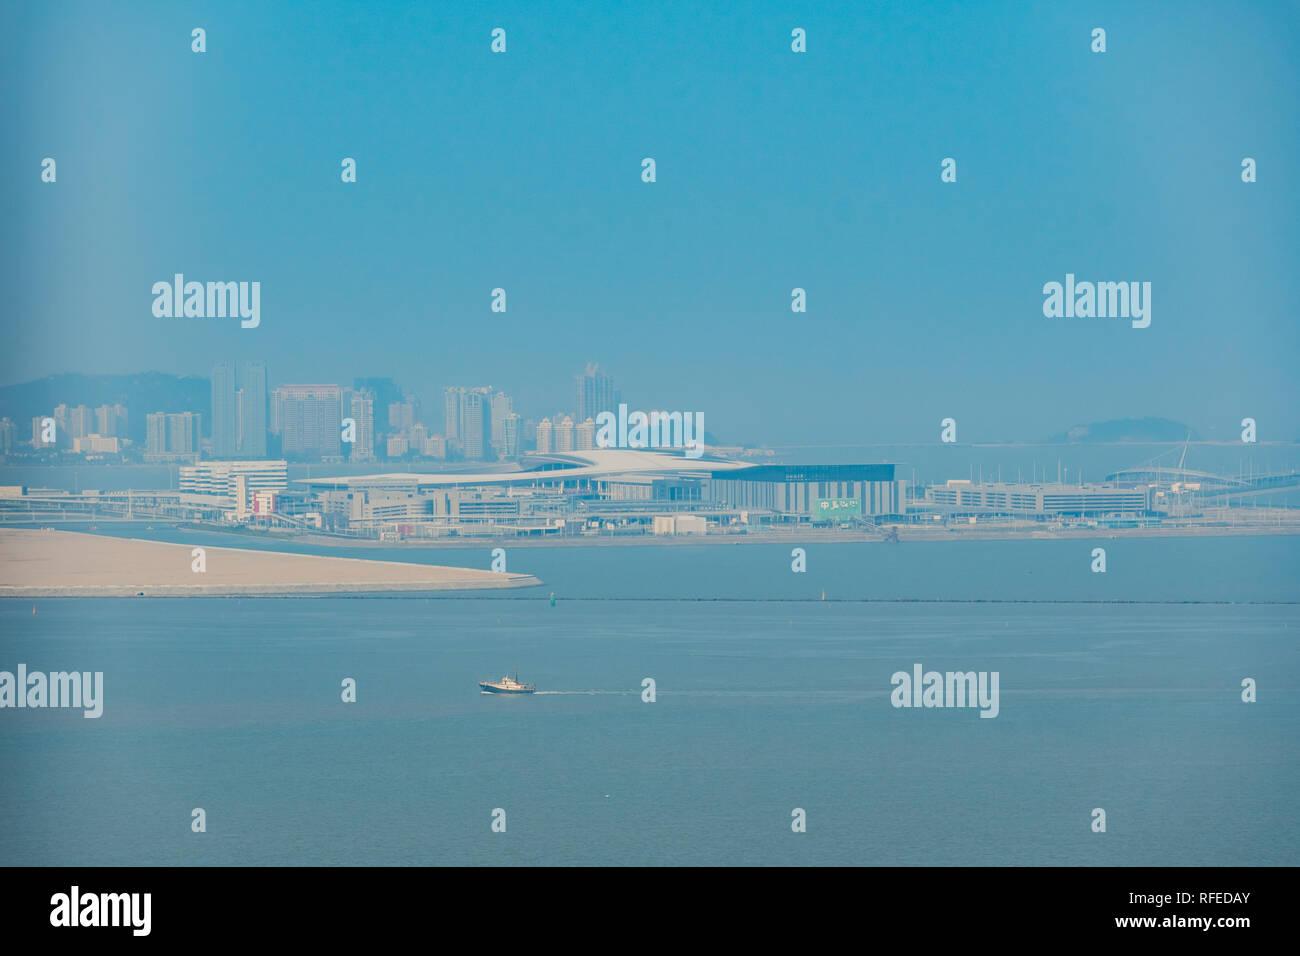 Aerial view of the Macau Boundary Crossing Facilities at Macau - Stock Image